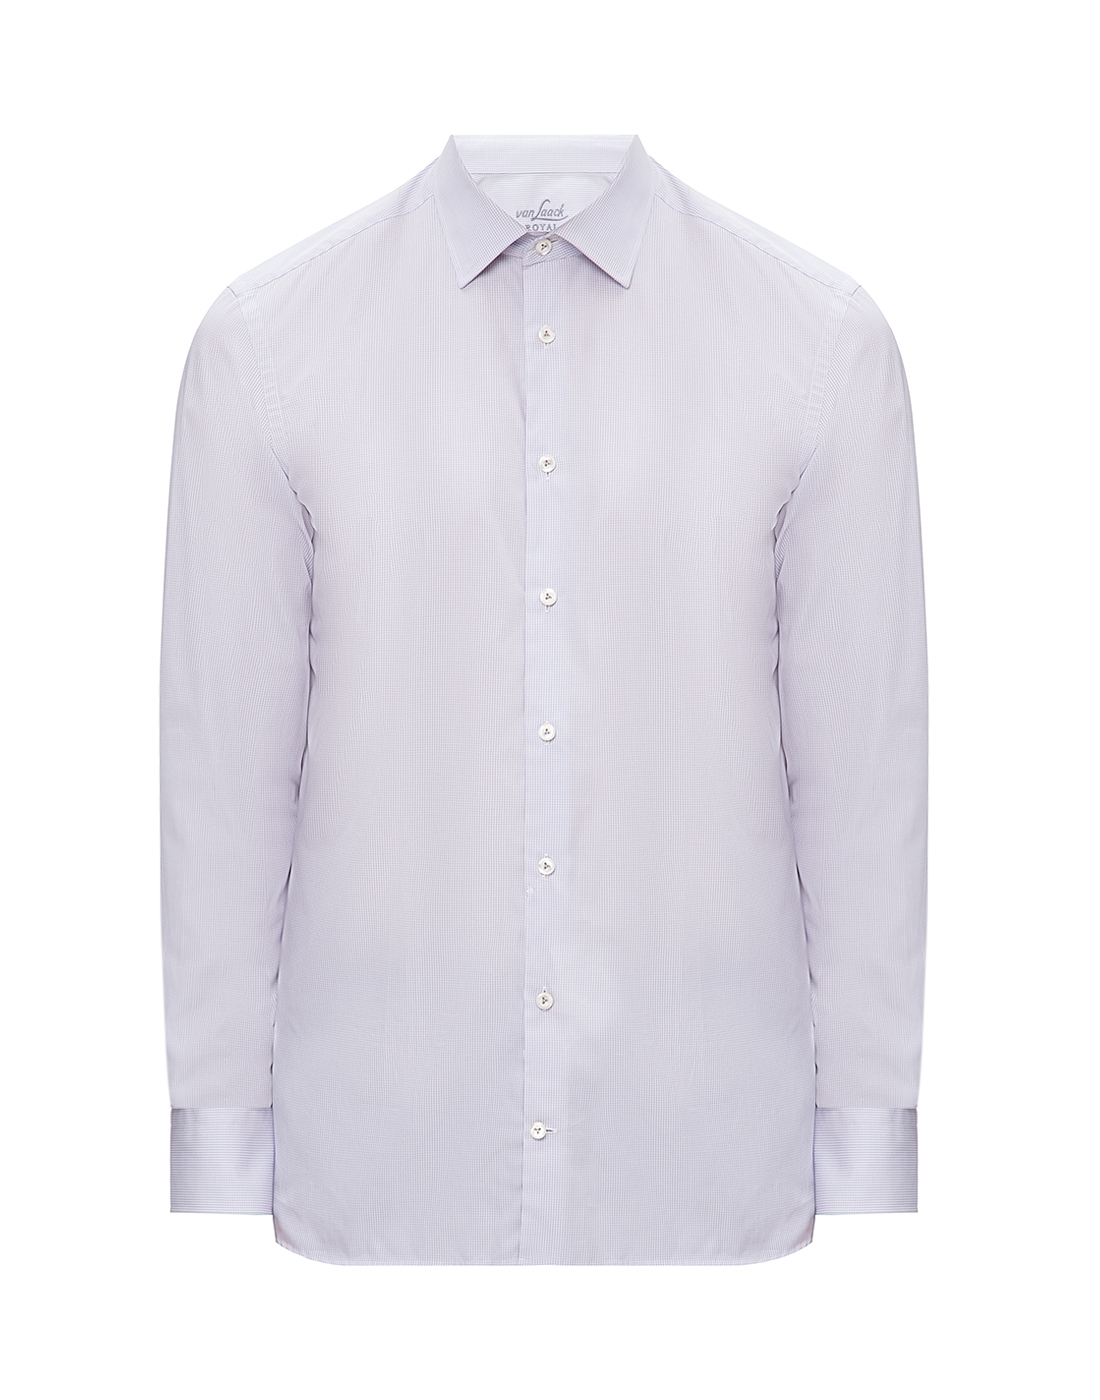 Мужская сиреневая рубашка Van Laack S163209/020-1